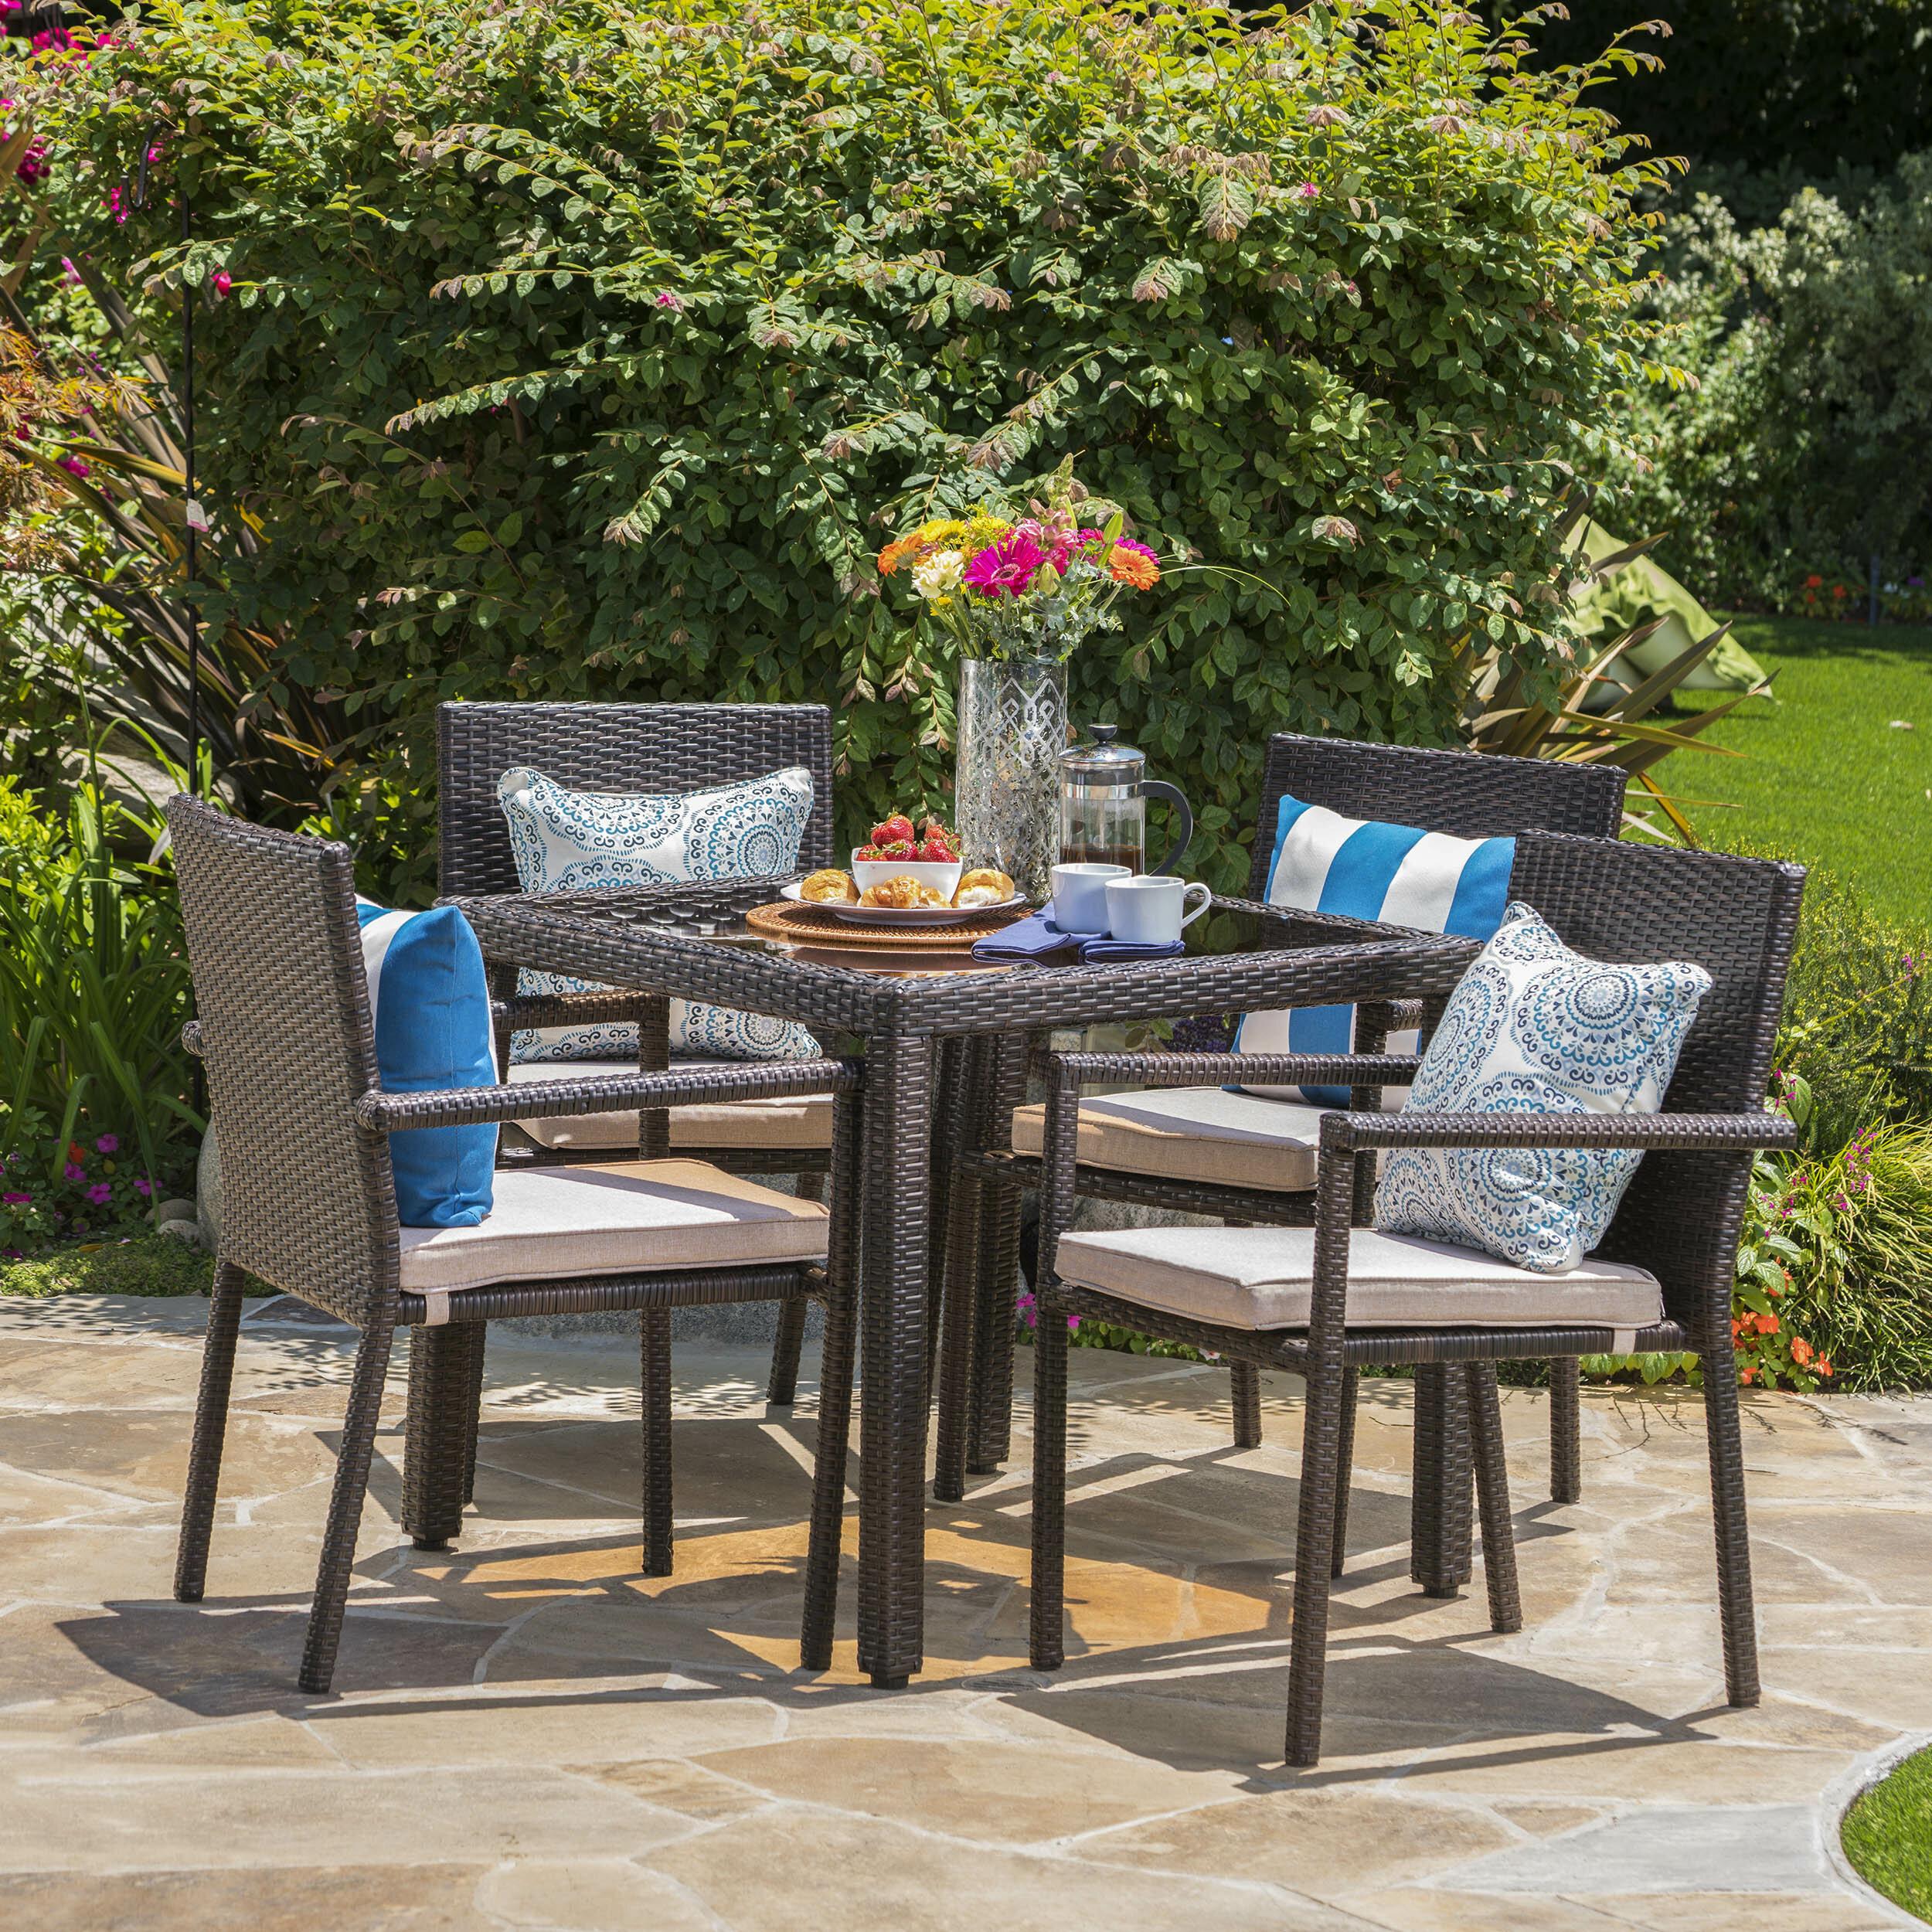 Outdoor furniture gumtree brisbane 2018 home comforts